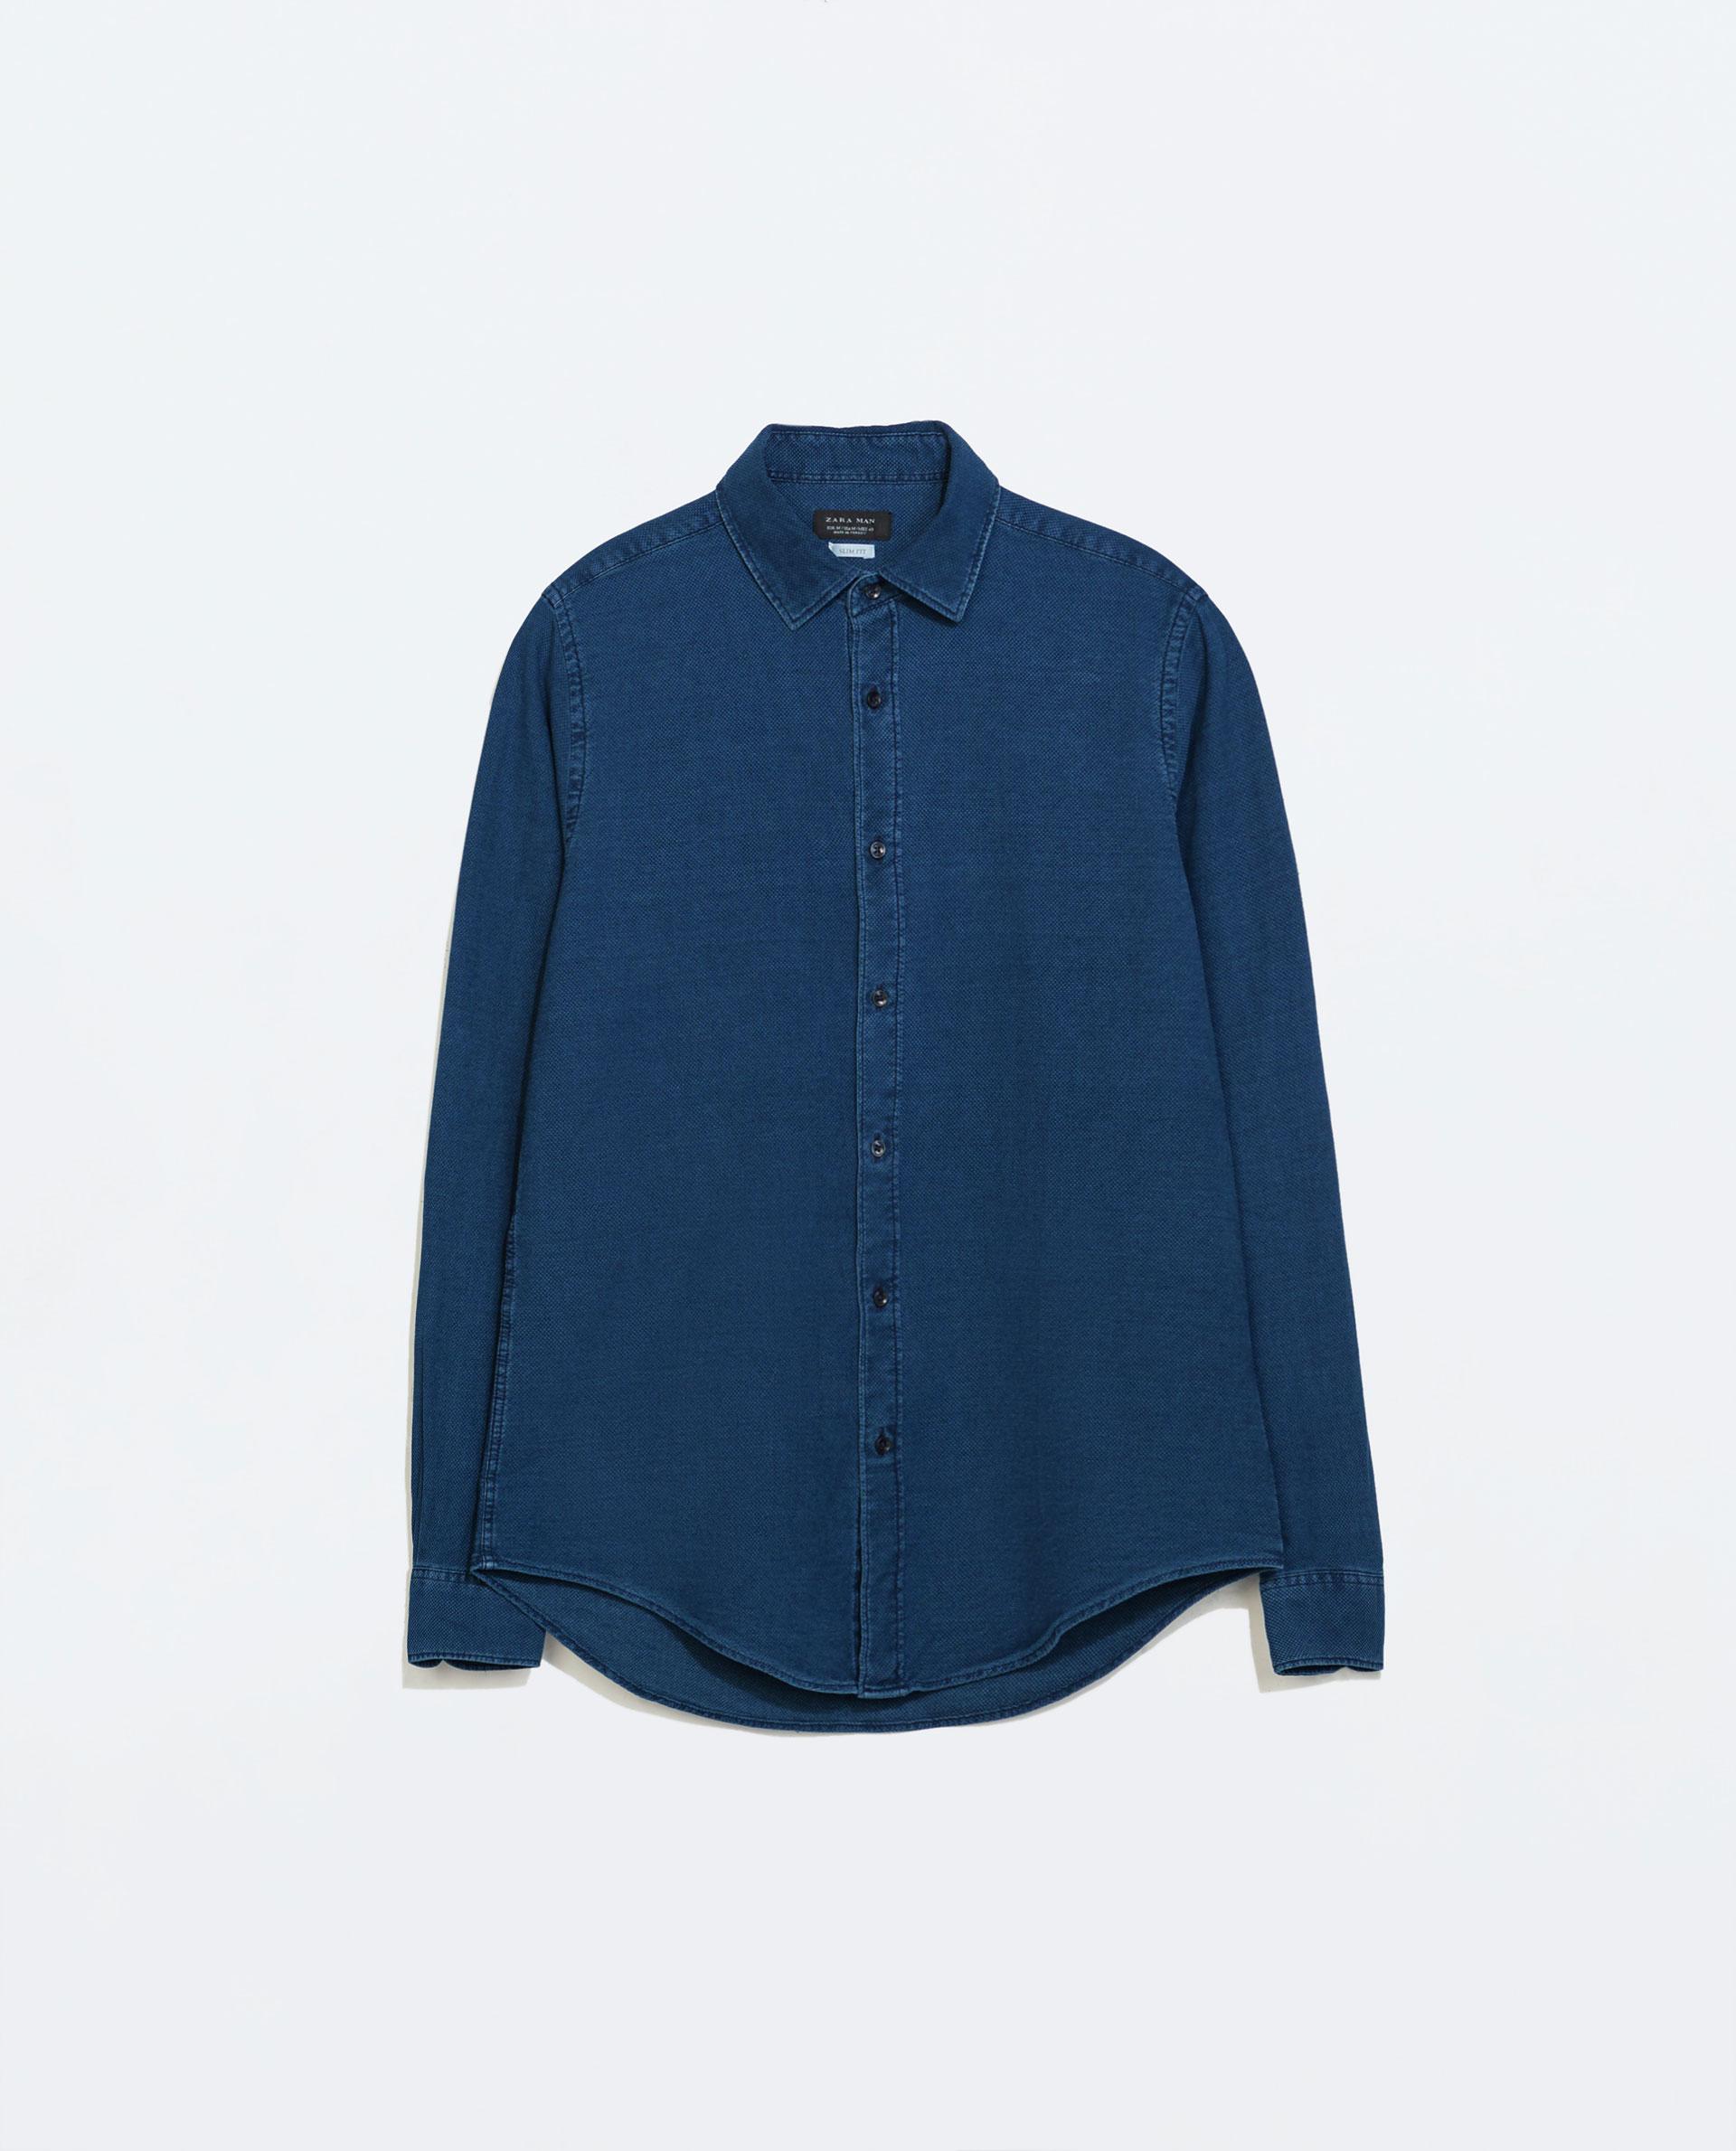 Zara structured shirt in blue for men lyst for Zara mens shirts sale